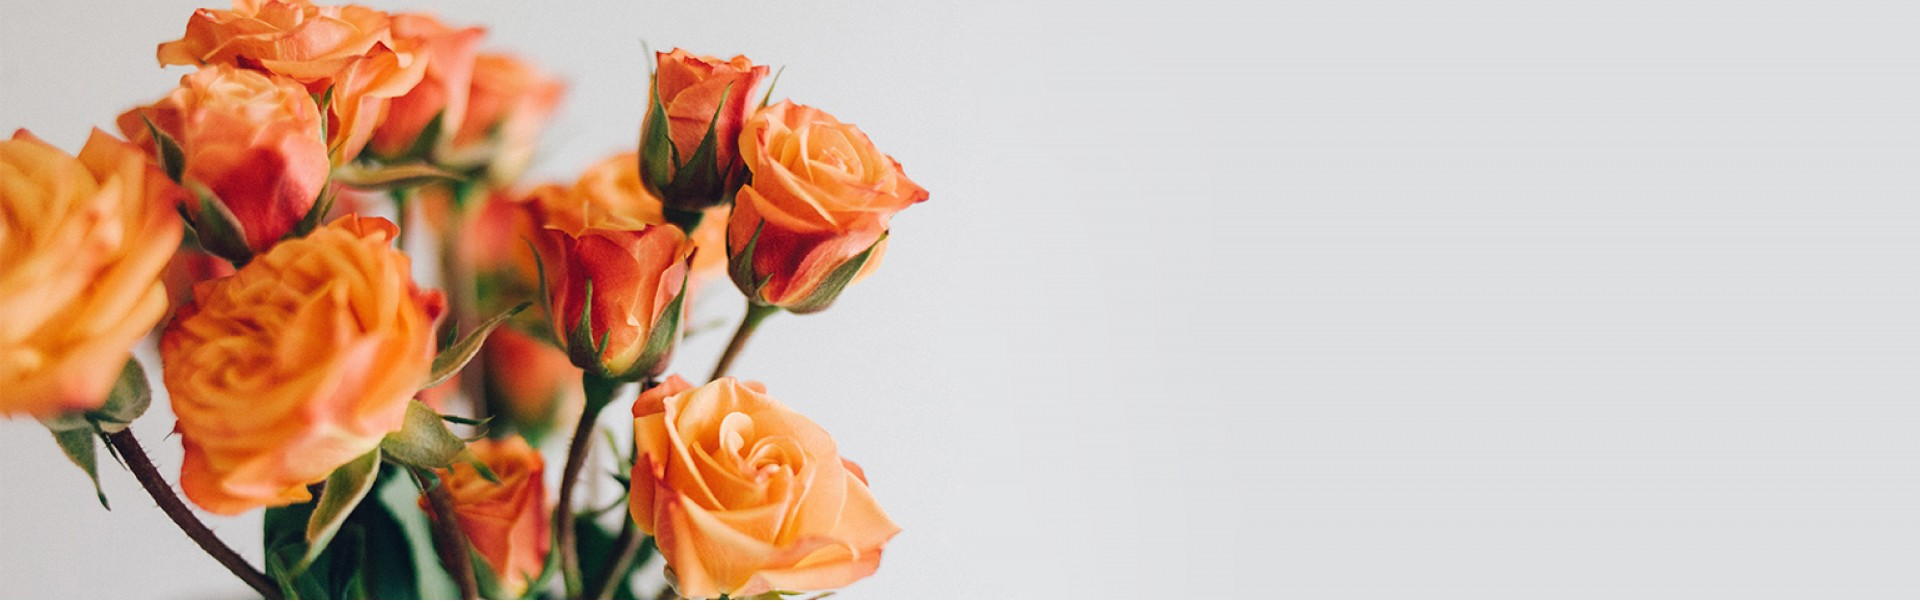 Gėles pristatome visoje Lietuvoje. Užsisakyk➔